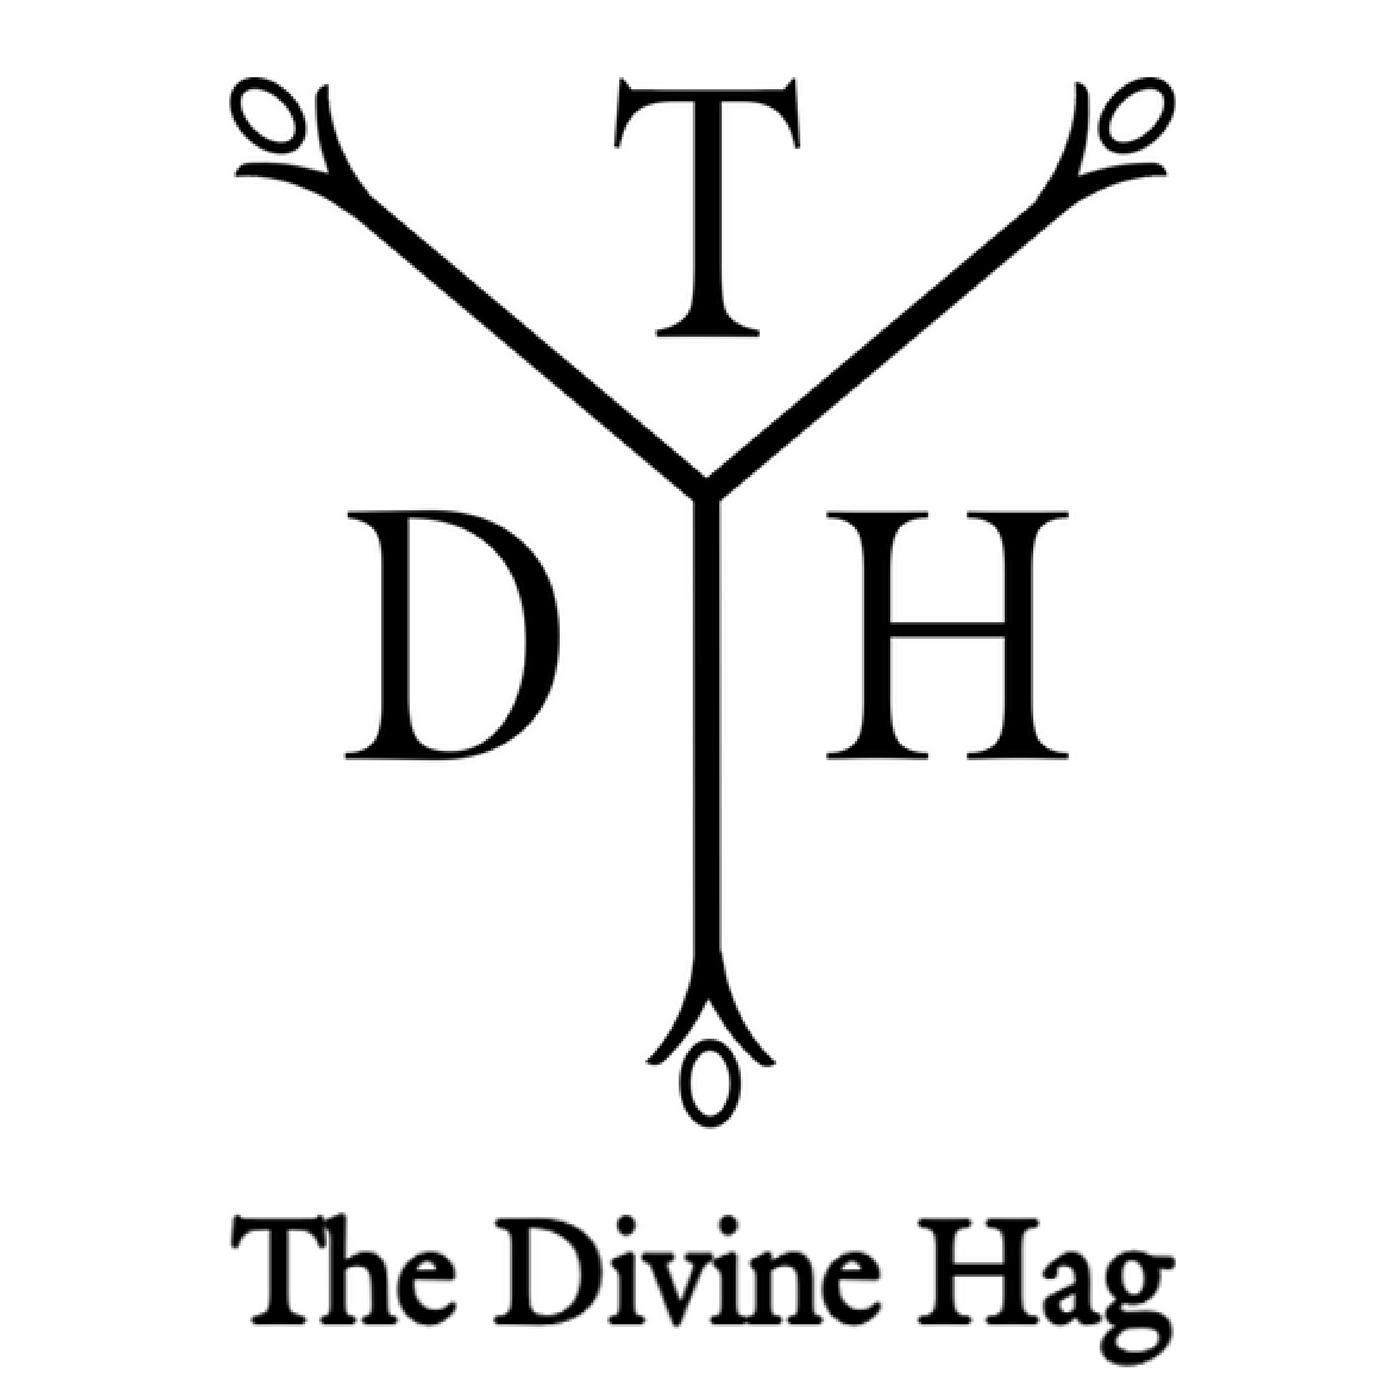 The Divine Hag Glasgow